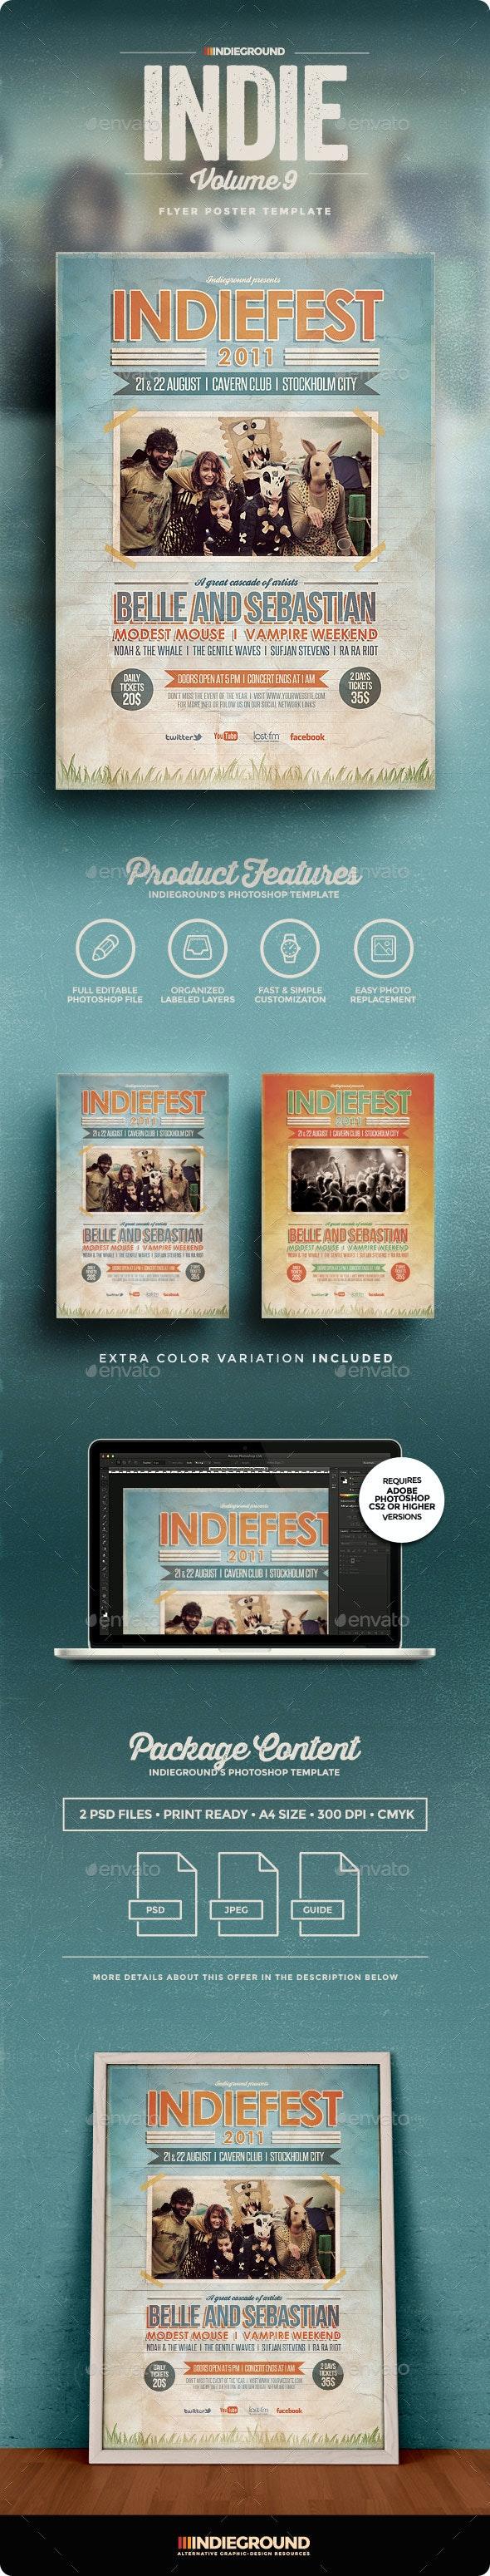 Indie Flyer/Poster Vol. 9 - Concerts Events